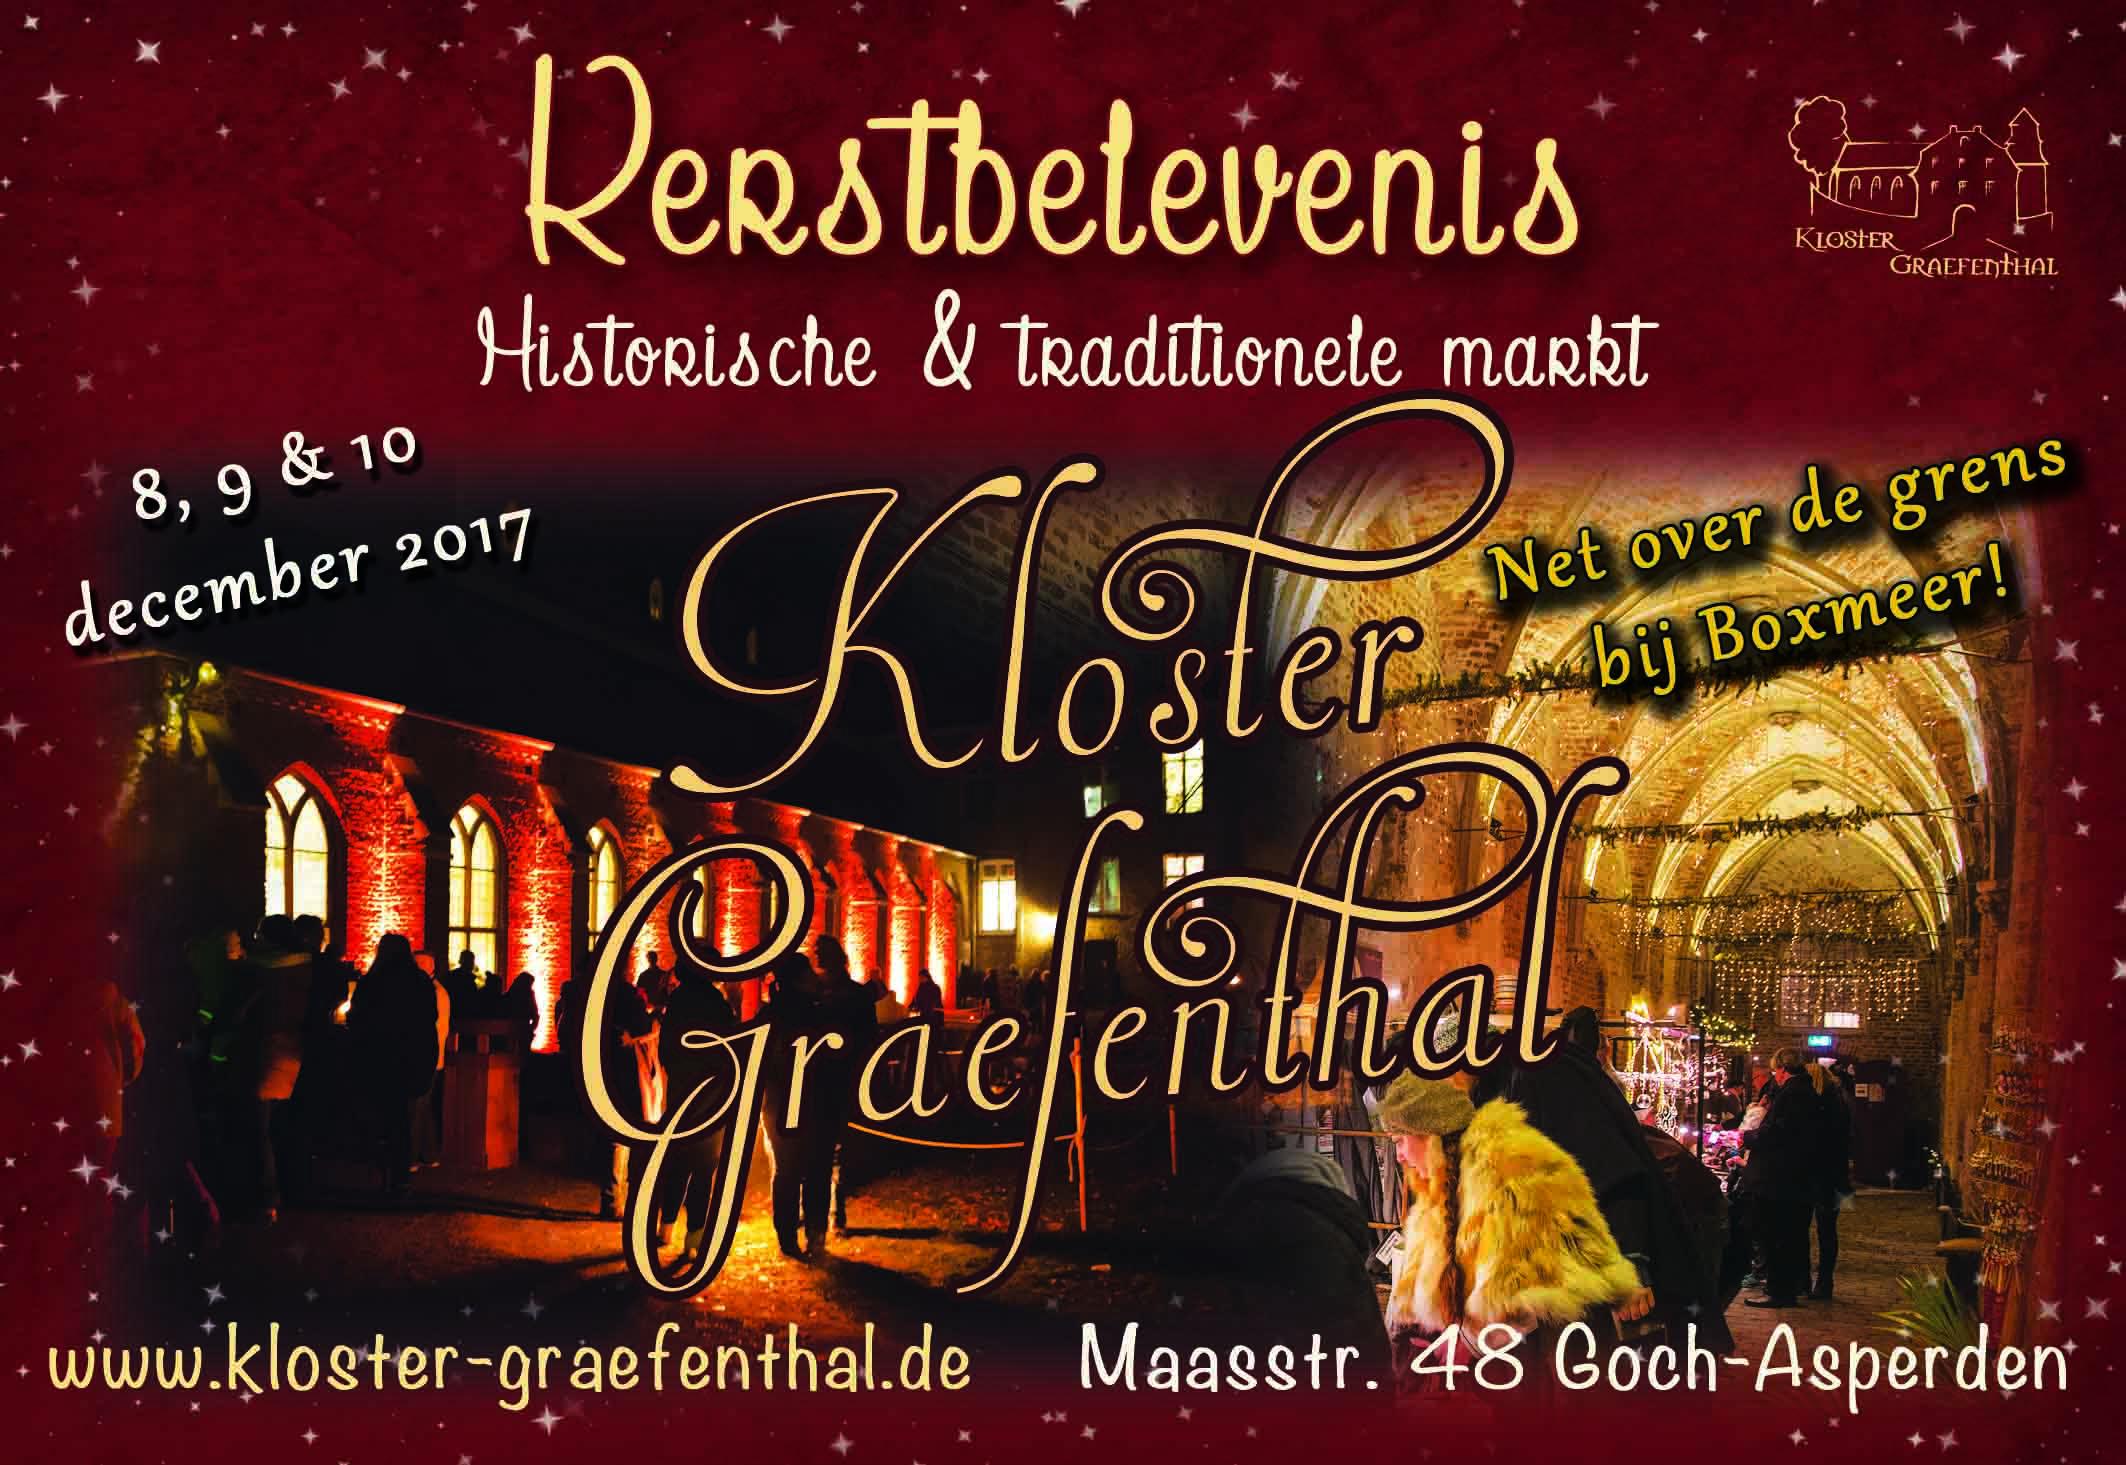 Kerstmarkt Klooster Graefenthal Agenda Nijmegen